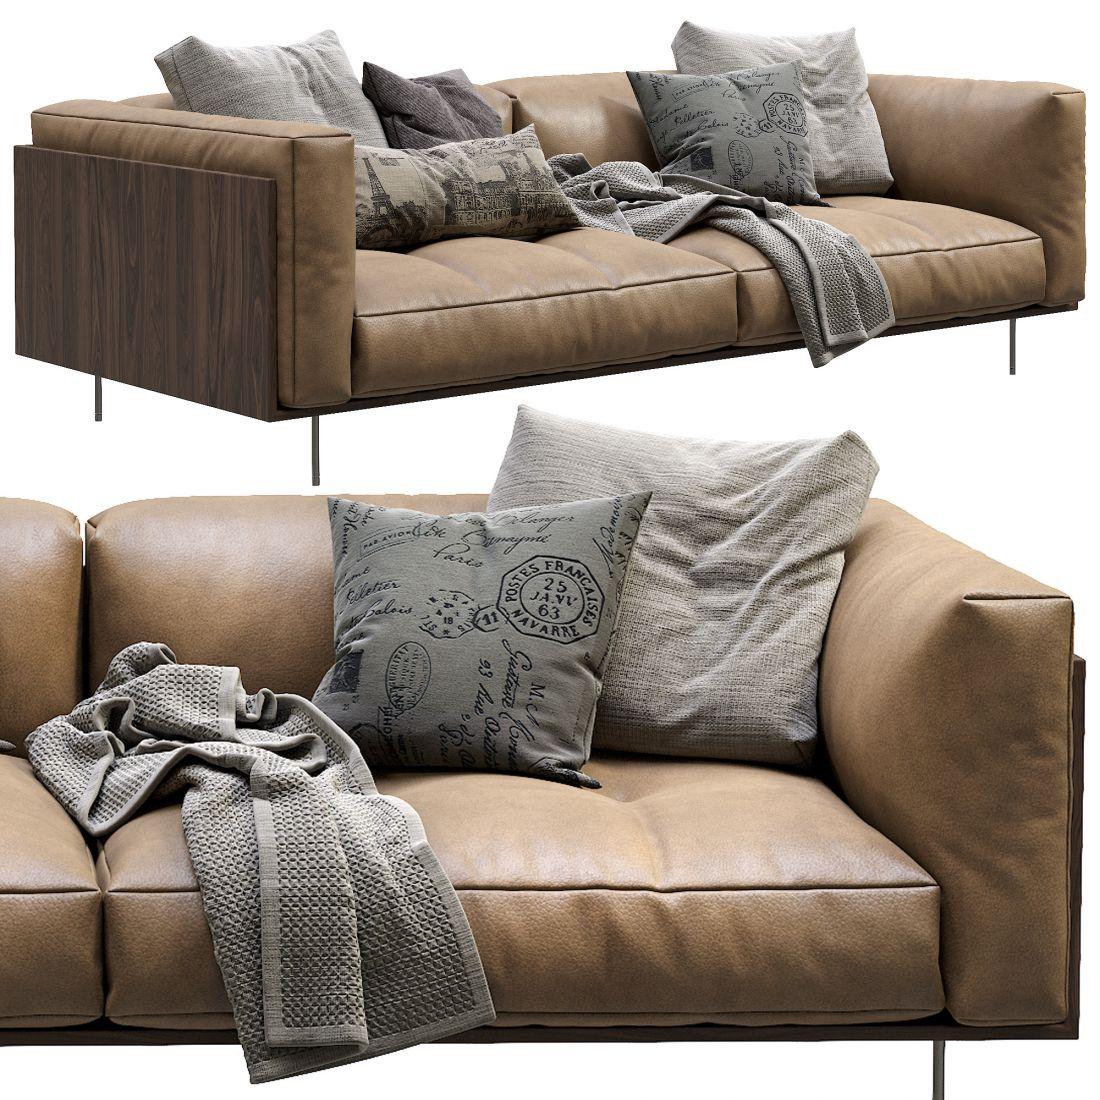 Living Divani Leather Sofa Rodwood - 3D Model for Corona